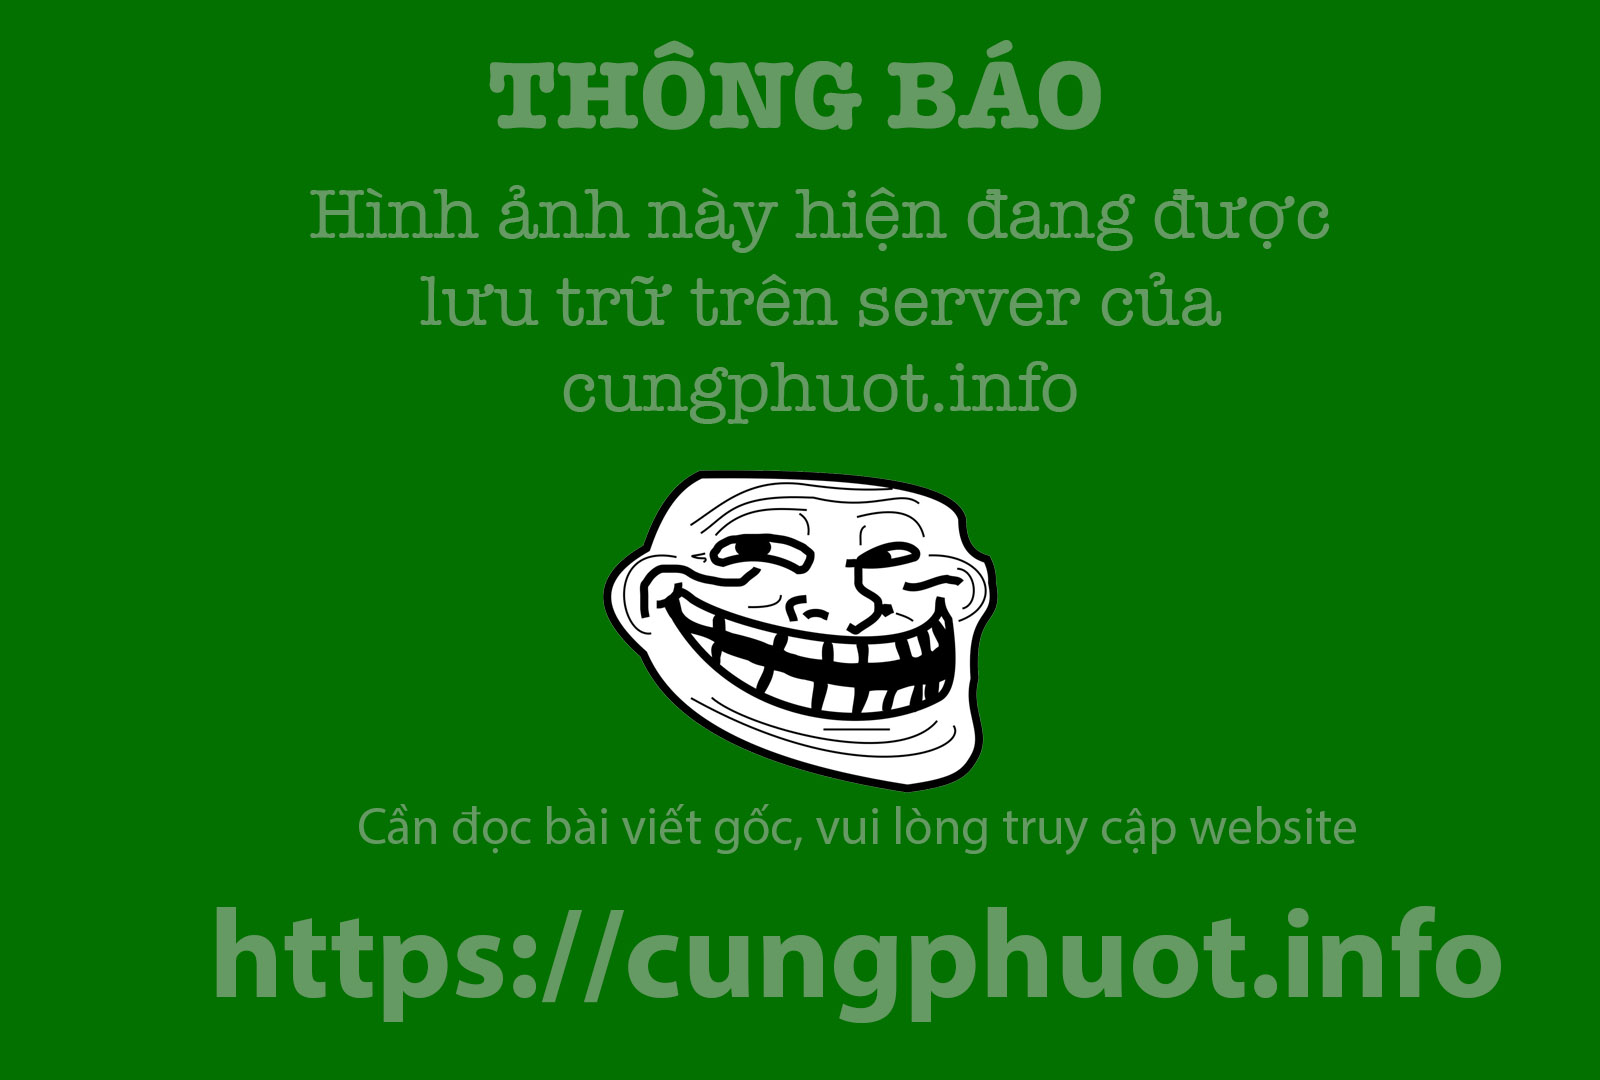 Ve dep thanh cao, huyen bi cua Dan vien Chau Son hinh anh 3